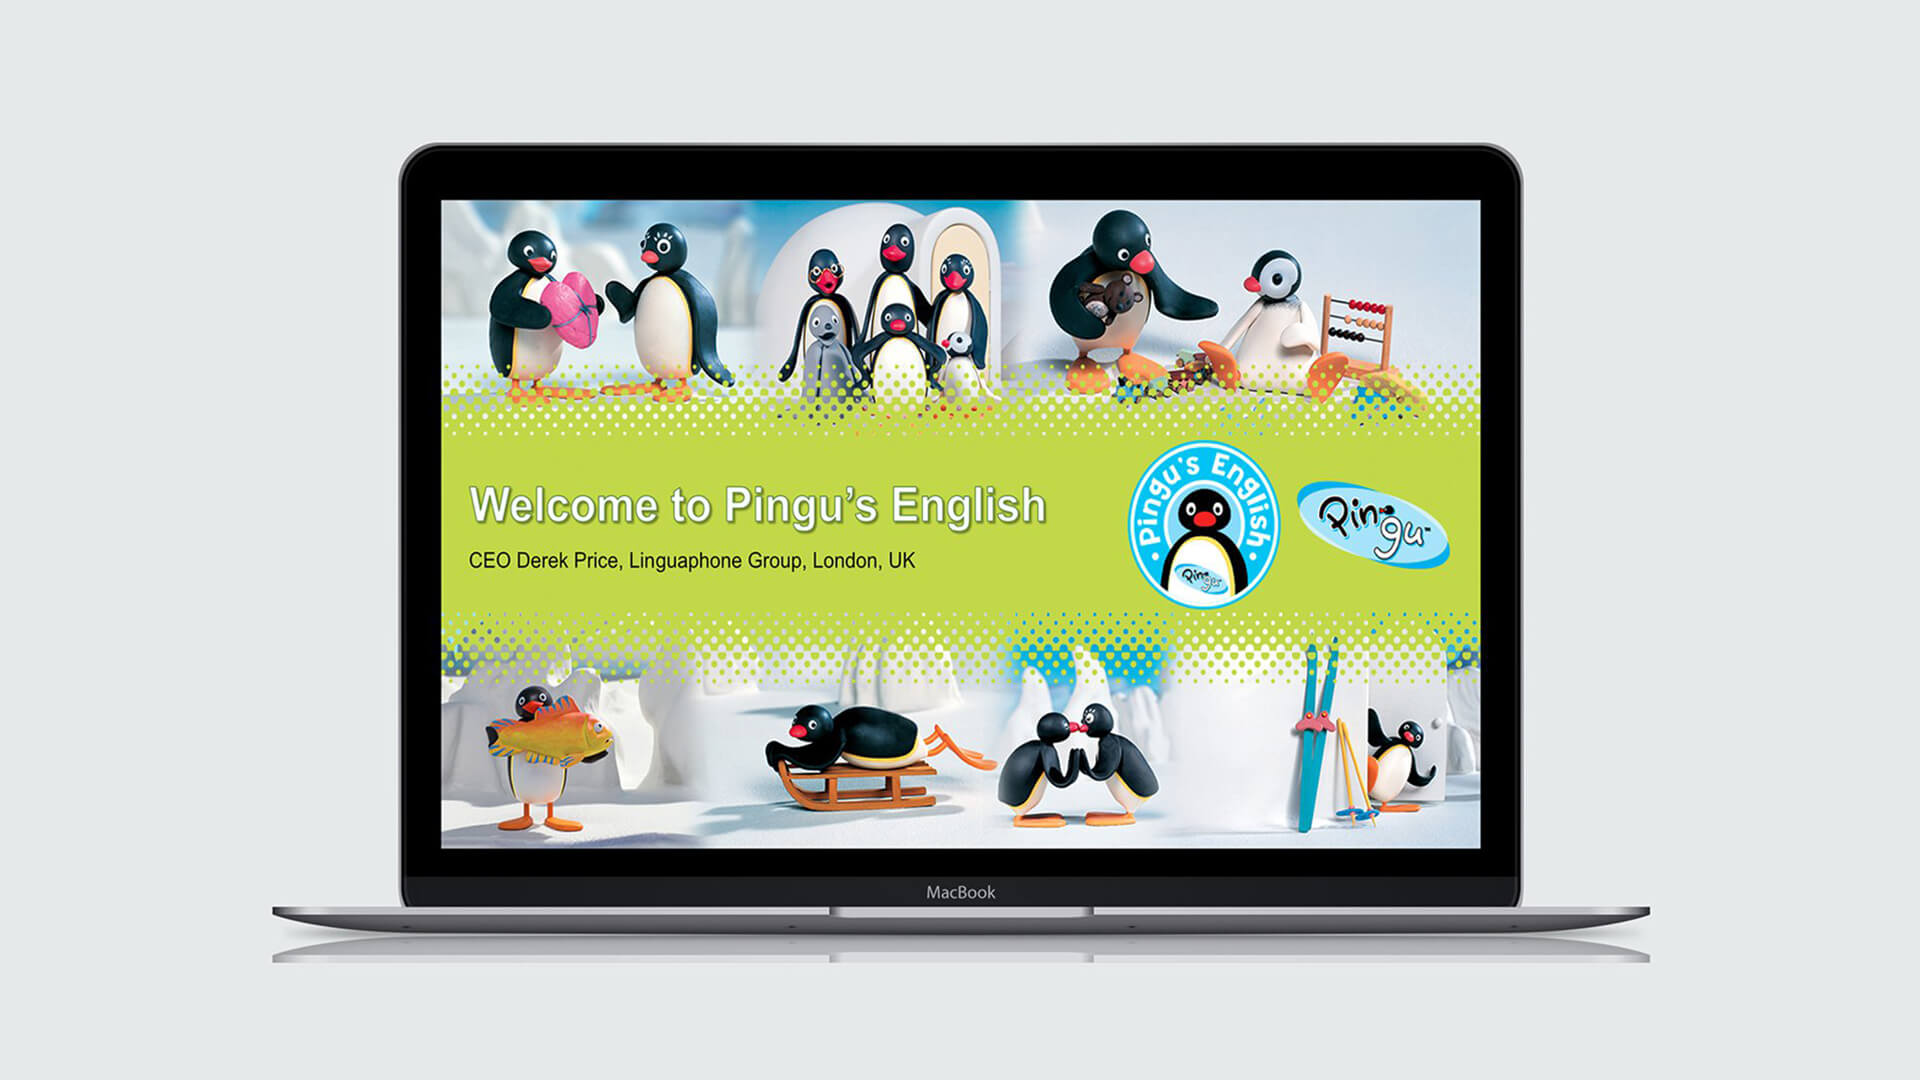 pingu's english south american language app